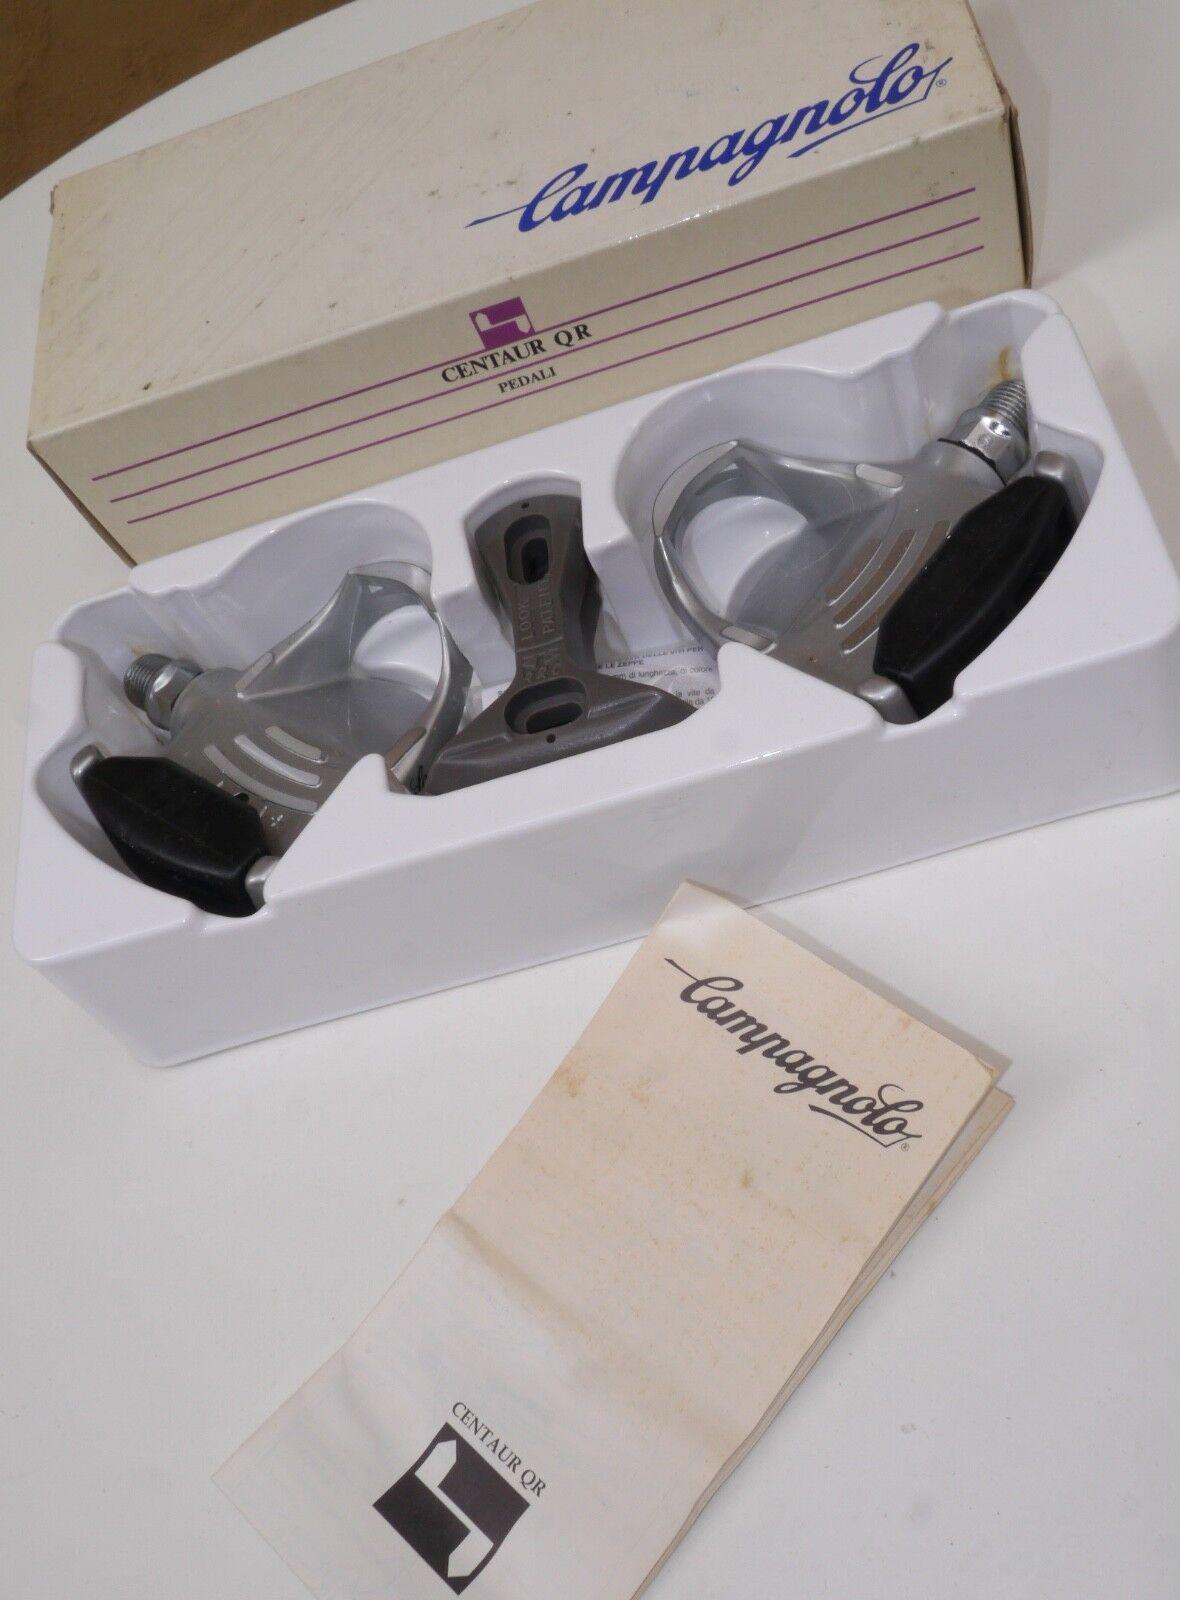 NOS Campagnolo Centaur QR pedals, retro mtb, mountain bike memorabilia